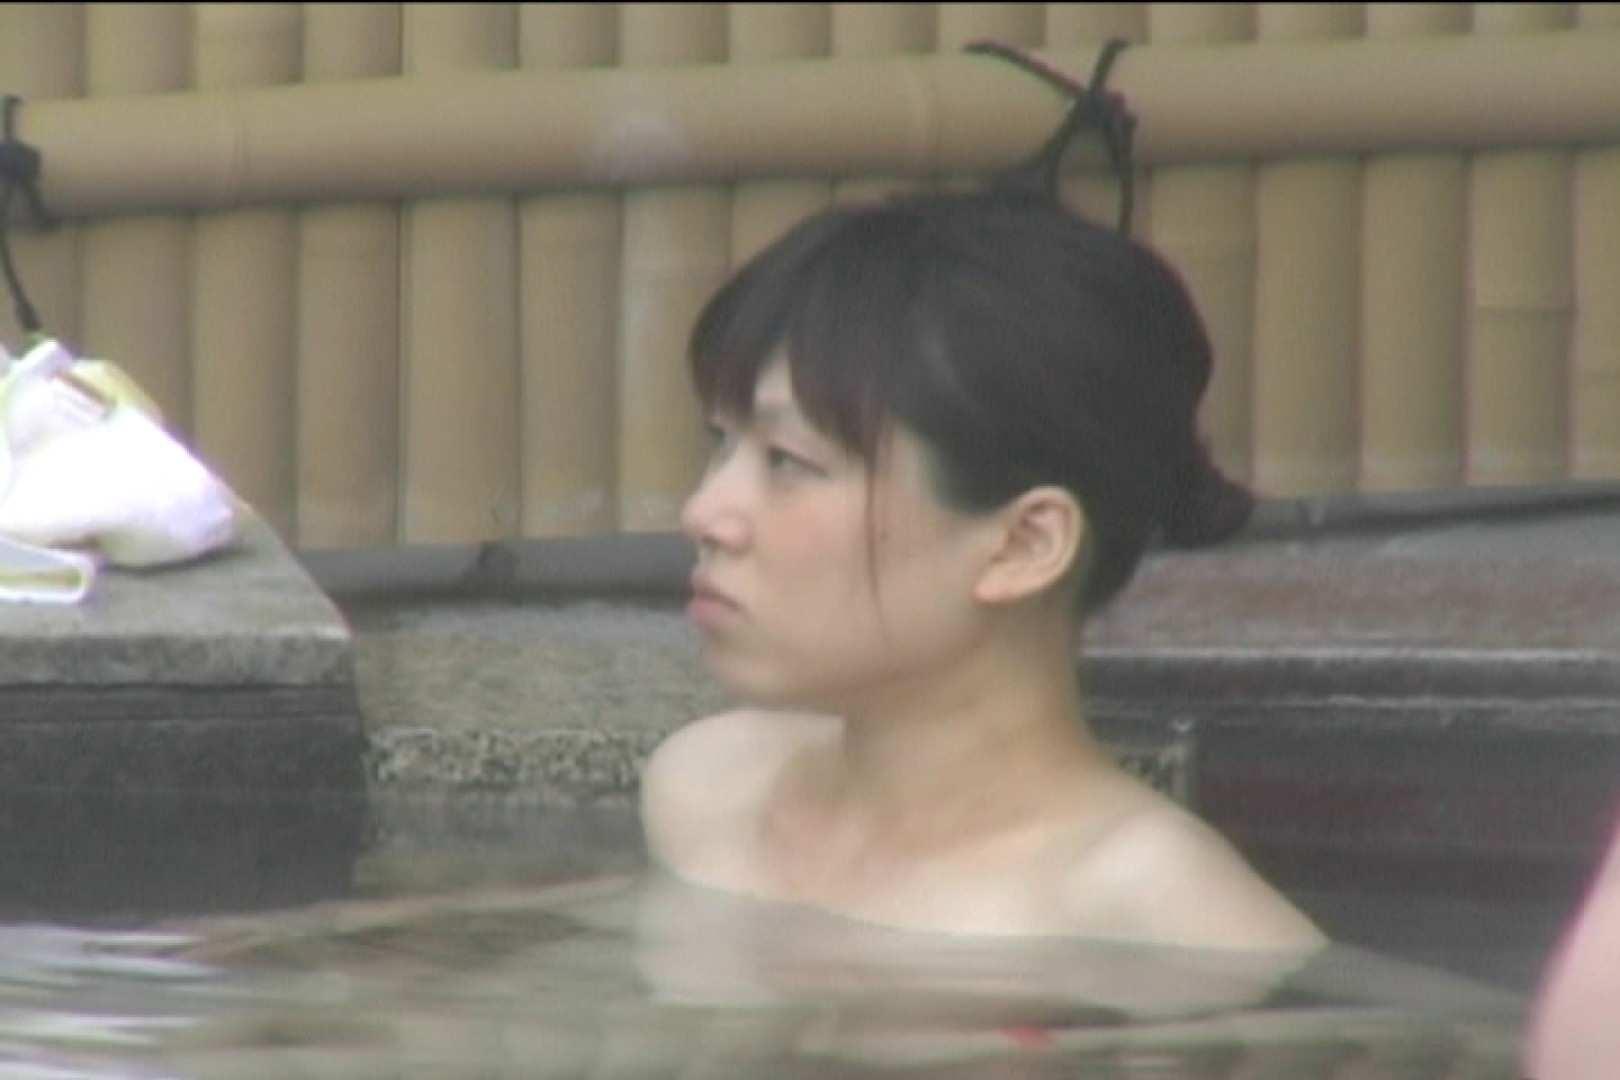 Aquaな露天風呂Vol.121 露天風呂編  82PIX 38